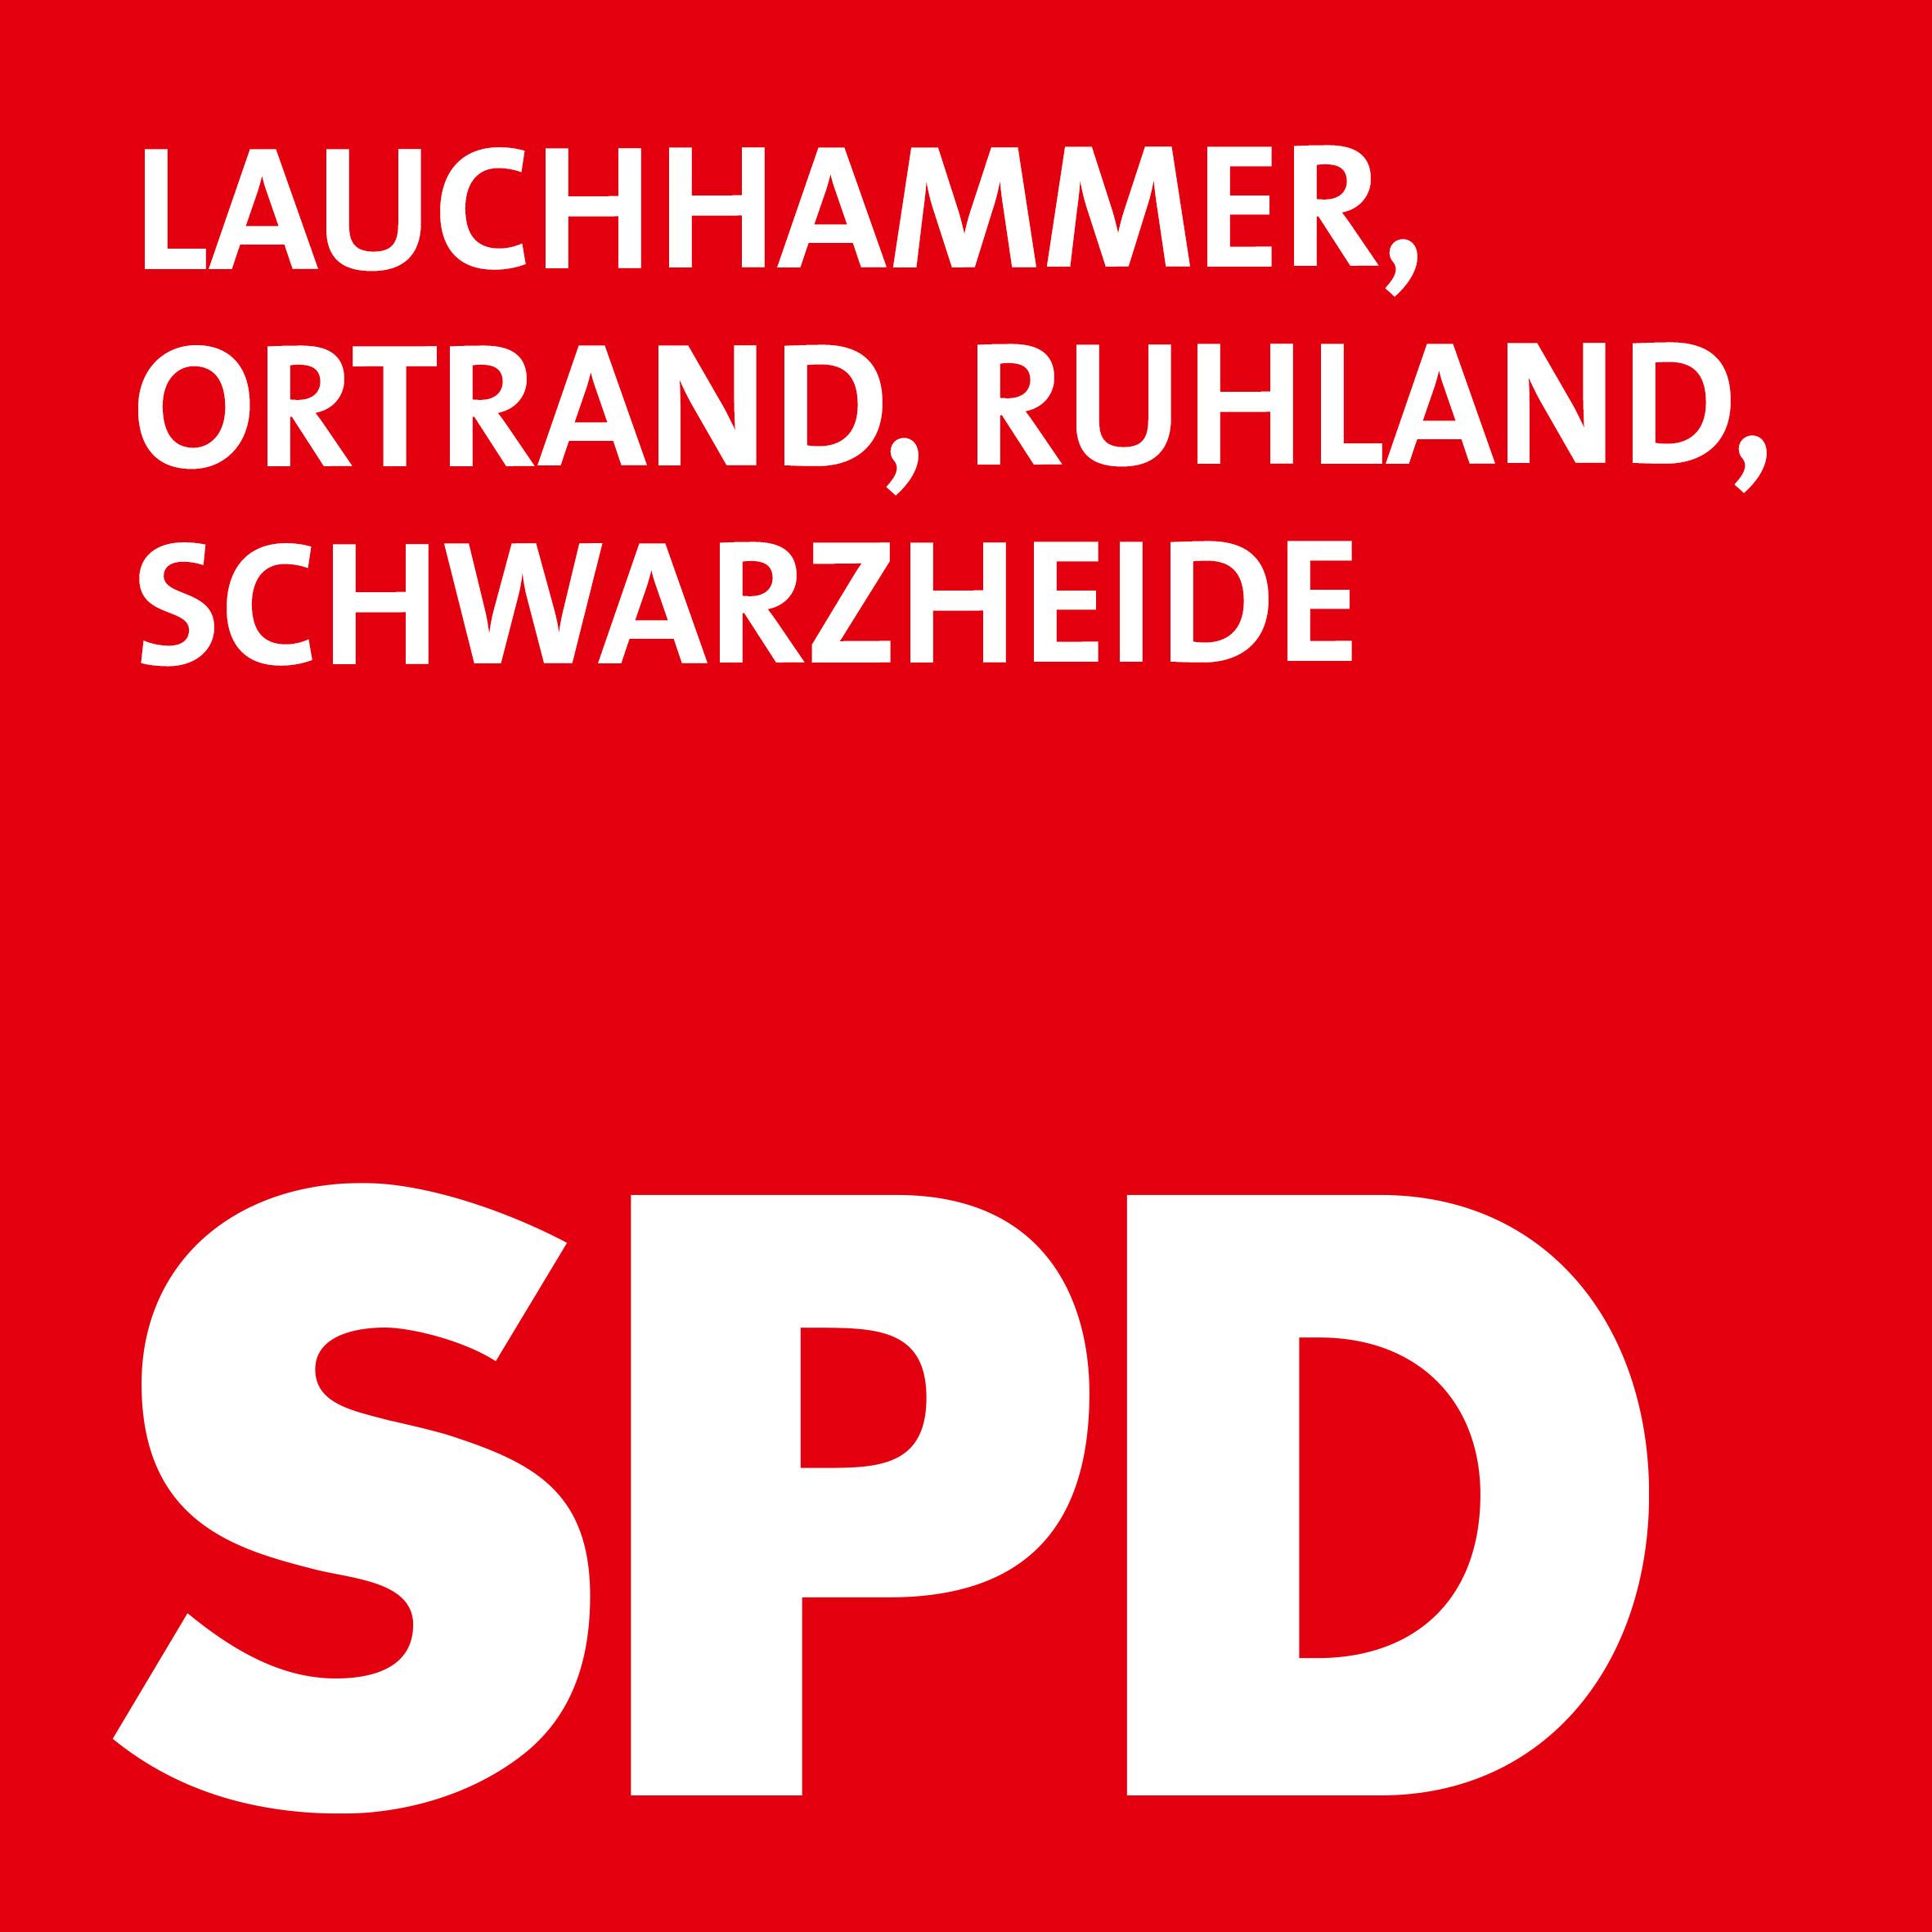 SPD Lauchhammer, Ortrand, Ruhland, Schwarzheide